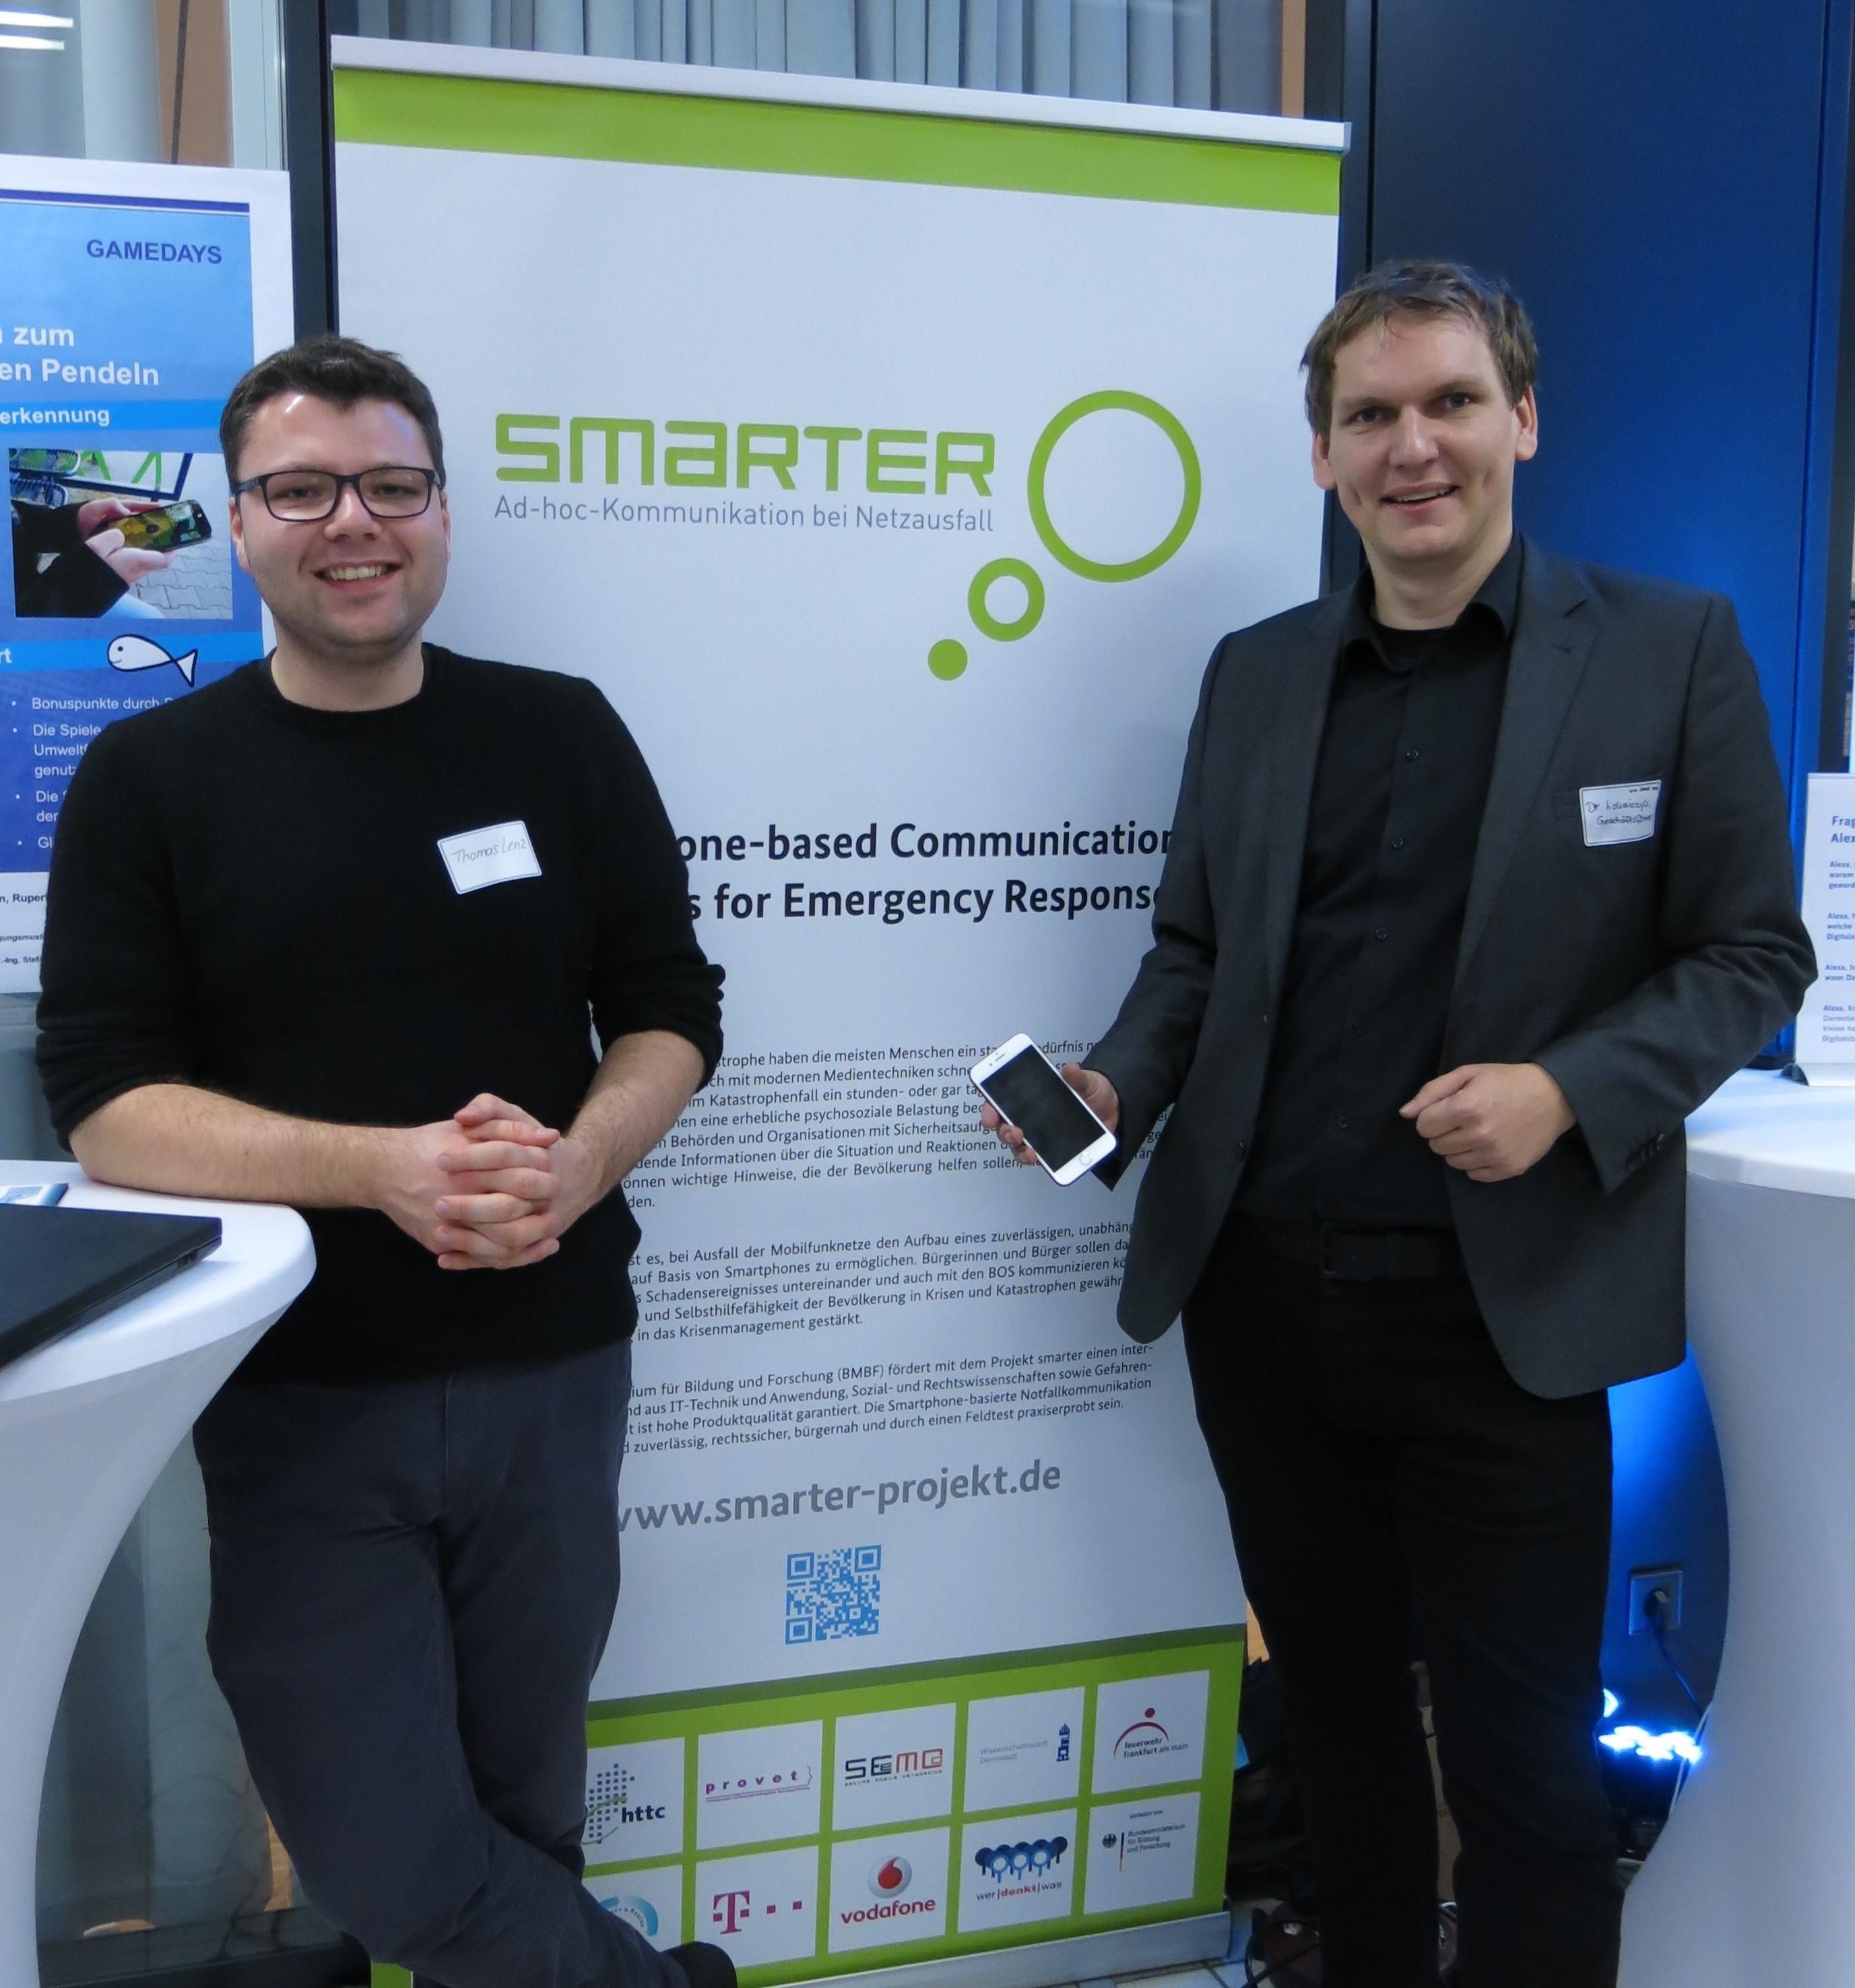 Thomas Lenz und Dr. Robert Lokaiczyk präsentieren smarter